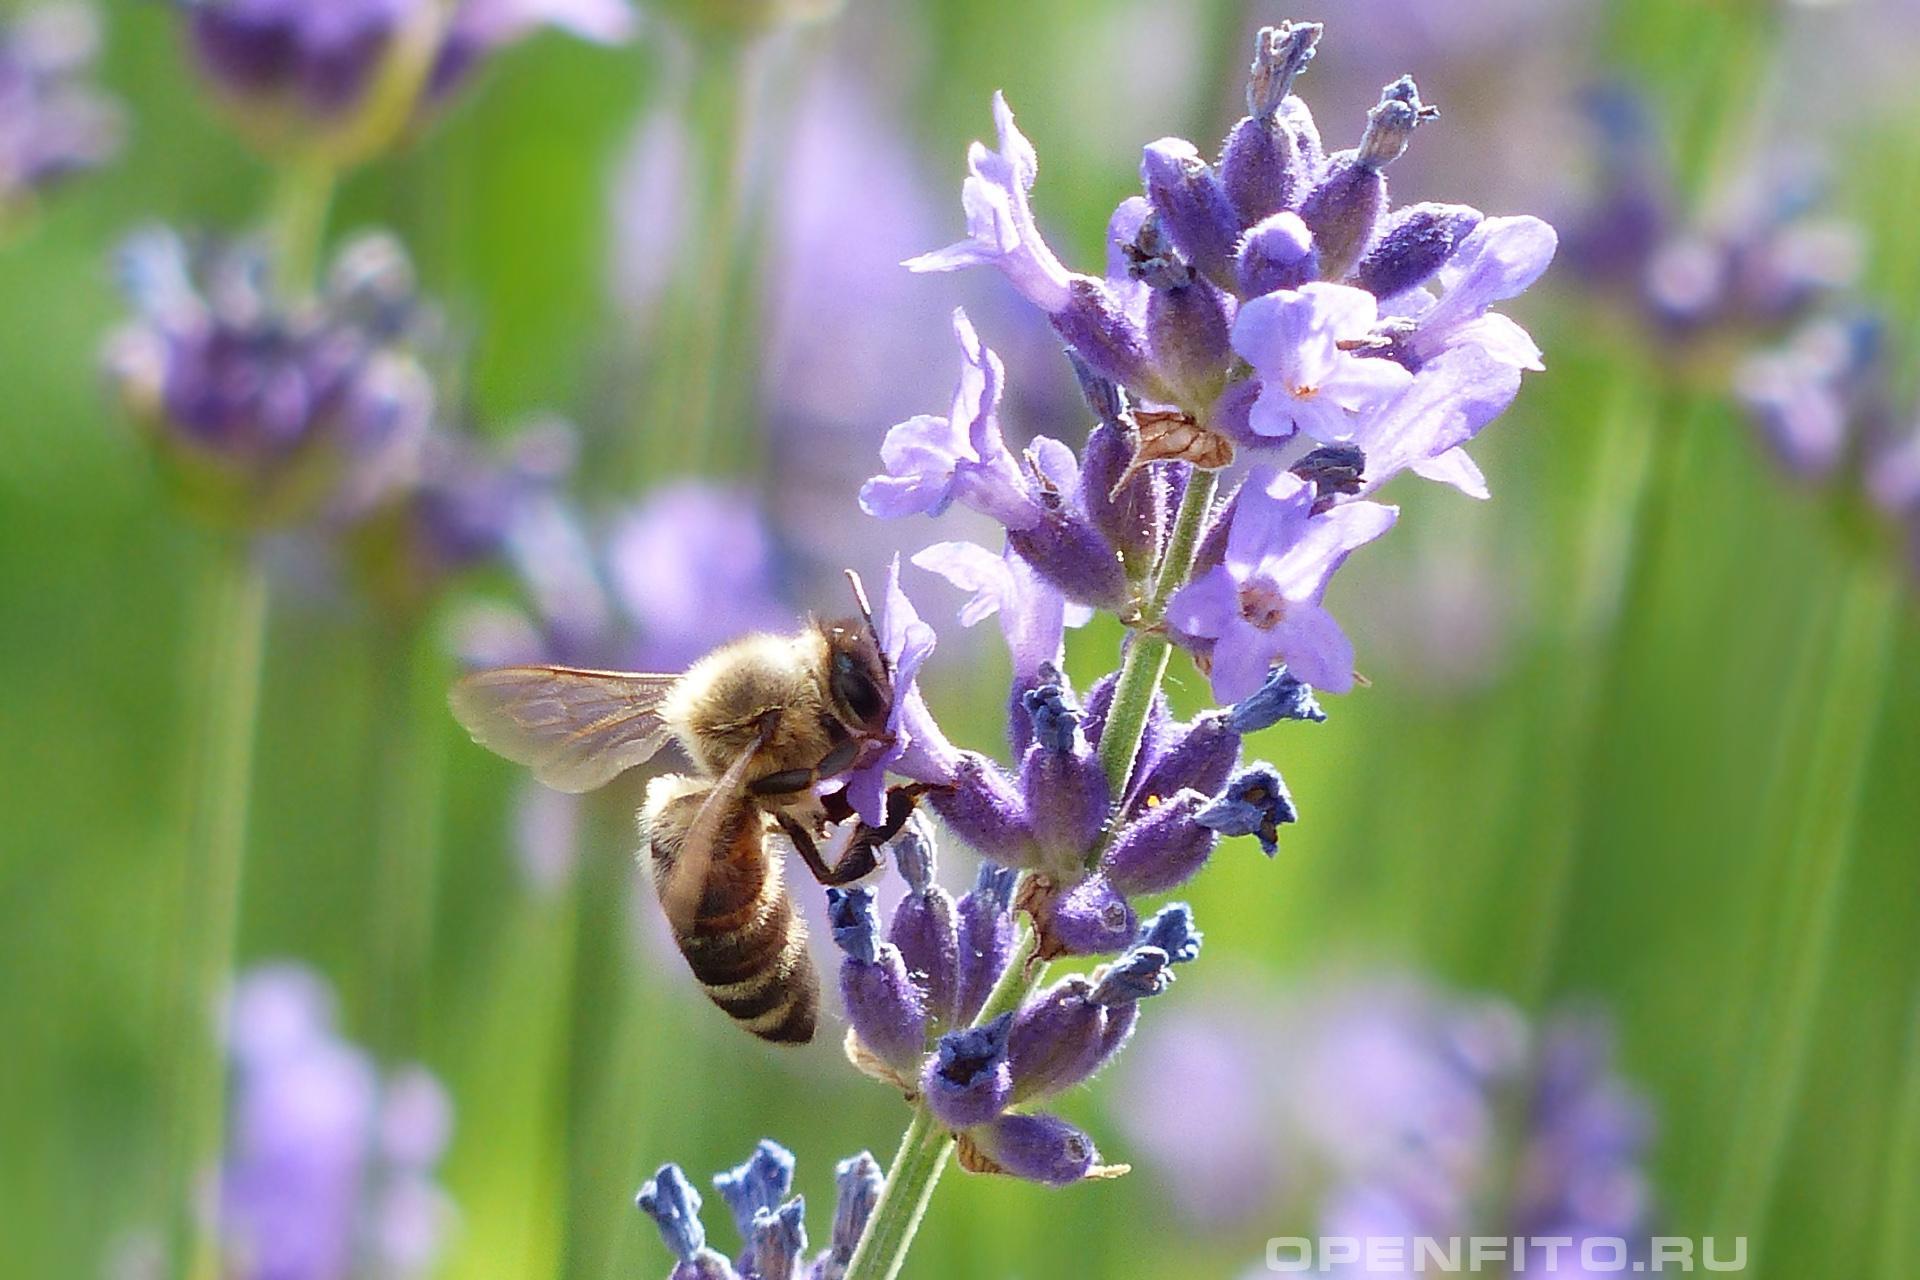 Лаванда пчела собирает нектар с цветков лаванды